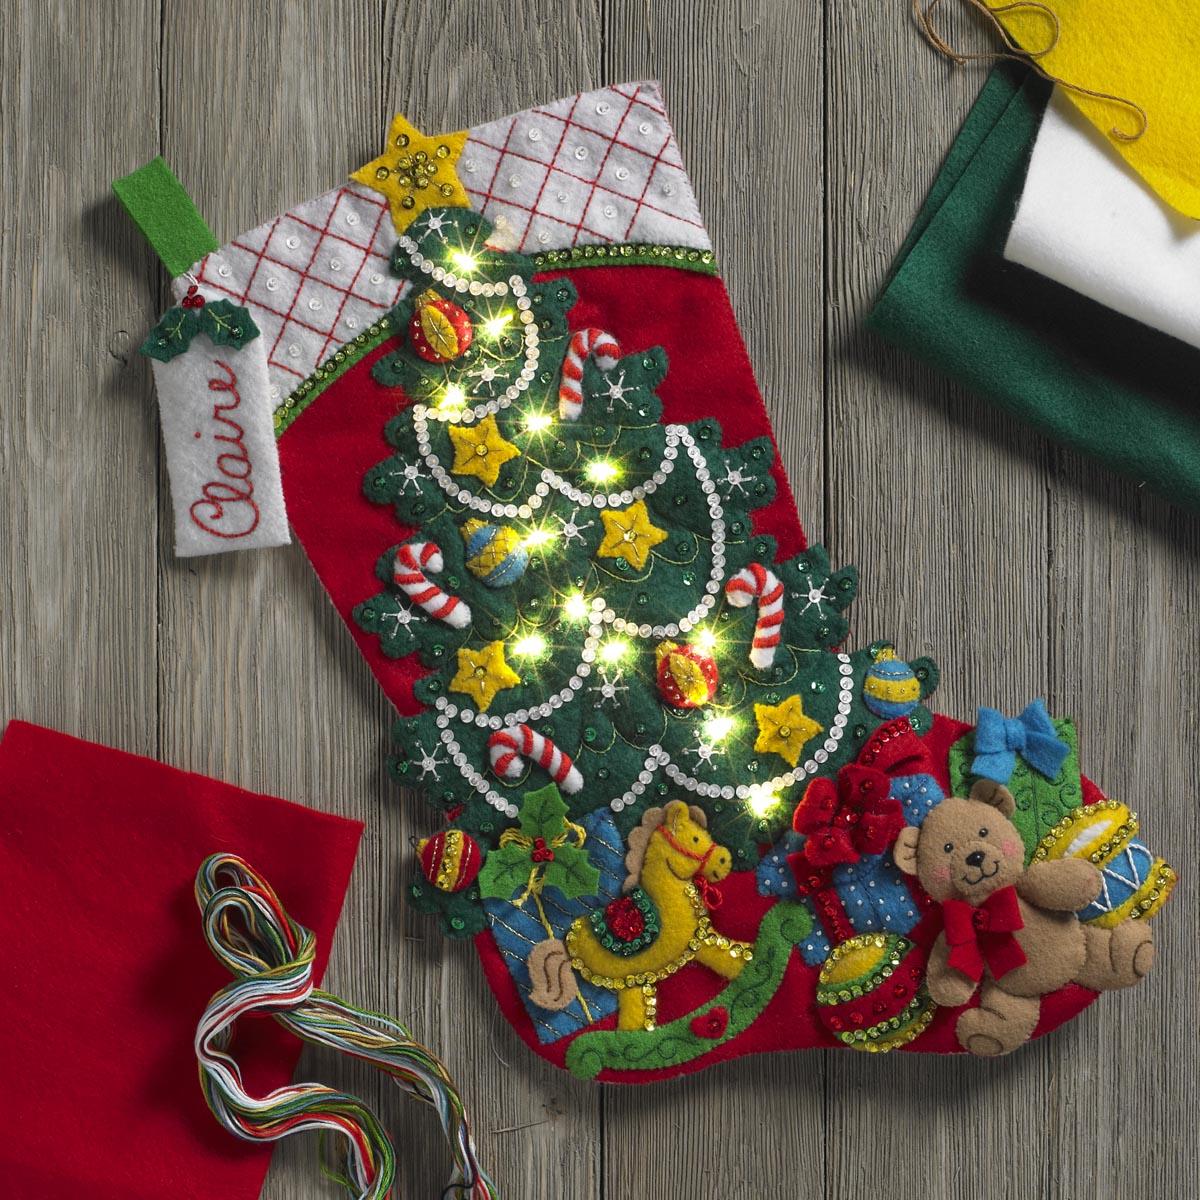 Bucilla ® Seasonal - Felt - Stocking Kits - Christmas Tree Surprise with Lights - 86710